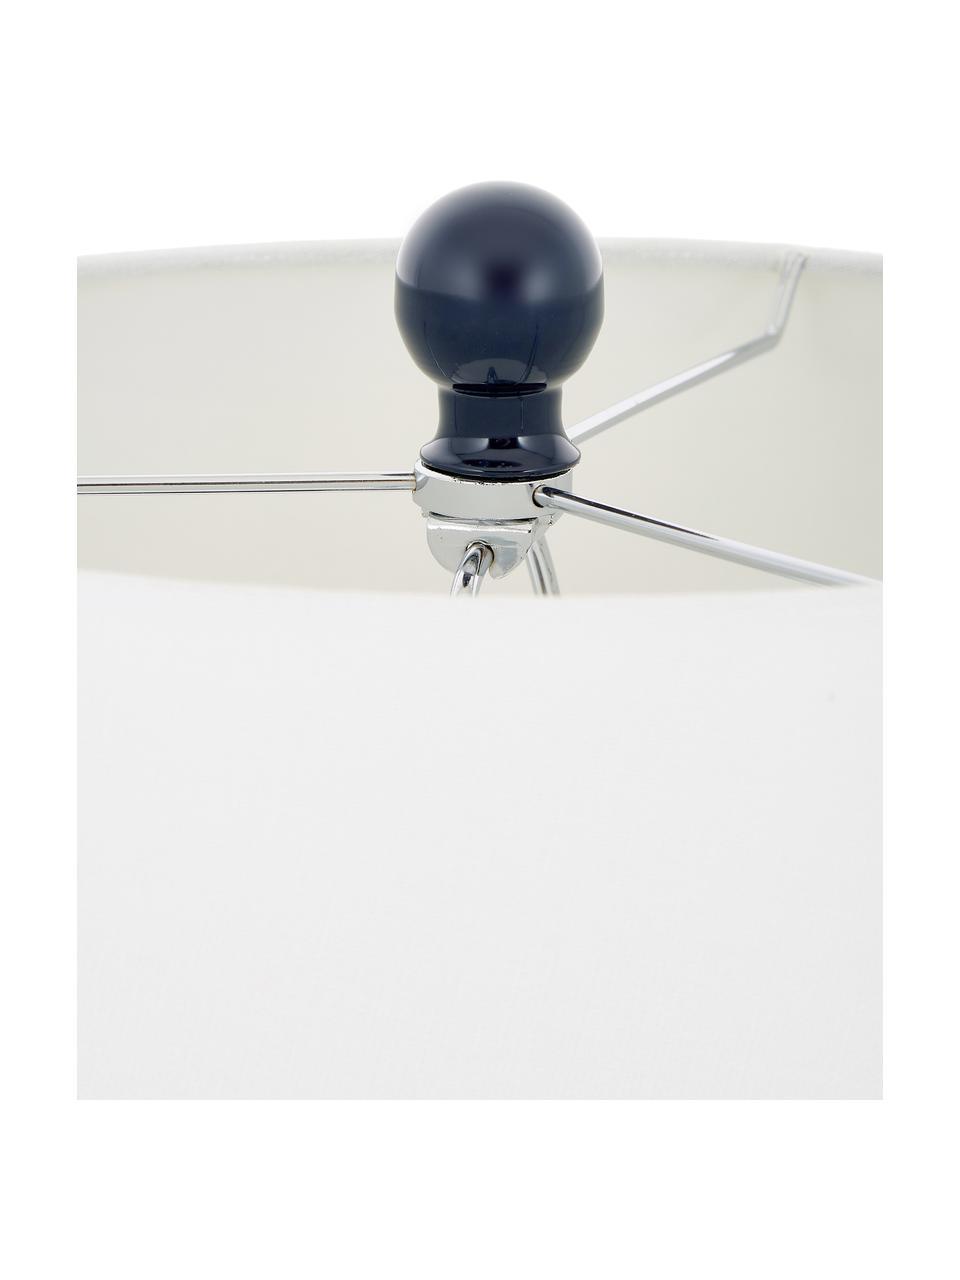 Große Tischlampen Felicitas, 2 Stück, Lampenschirm: Baumwolle, Lampenfuß: Glas, lackiert, Sockel: Metall, Blau, Ø 35 x H 58 cm